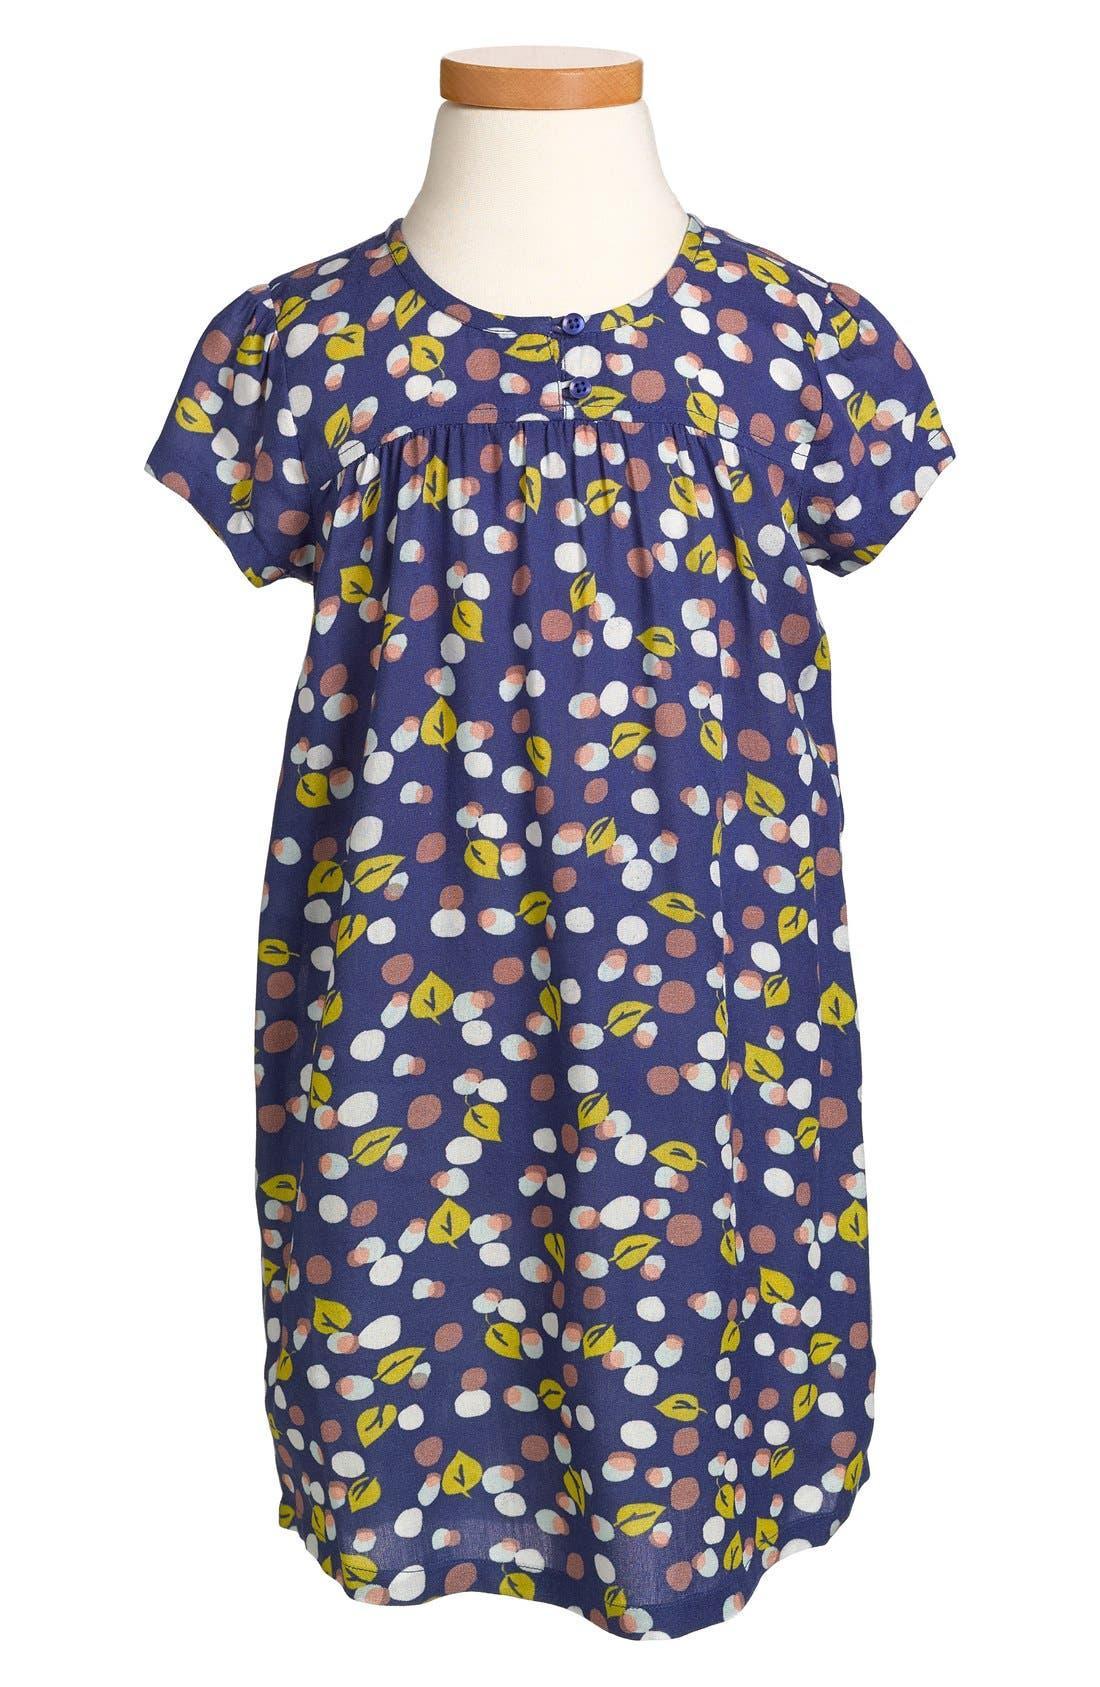 Alternate Image 1 Selected - Tucker + Tate 'Akira' Floral Print Dress (Toddler Girls, Little Girls & Big Girls)